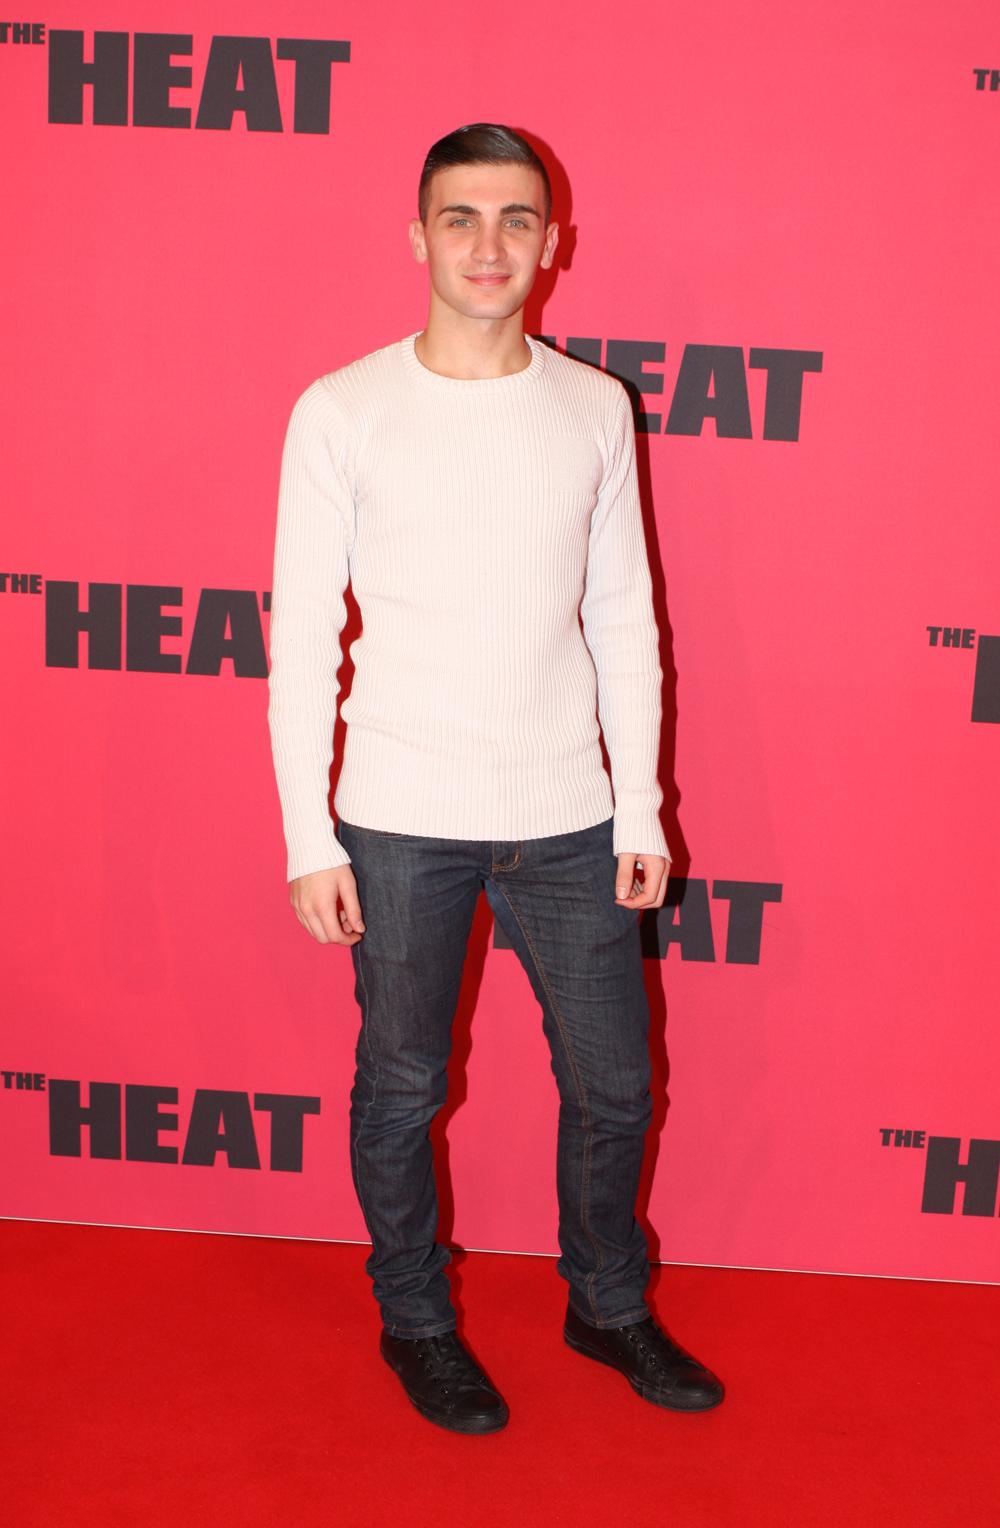 Melissa Mccarthy Dr Oz: Music News Australia: The Heat Red Carpet Movie Premiere